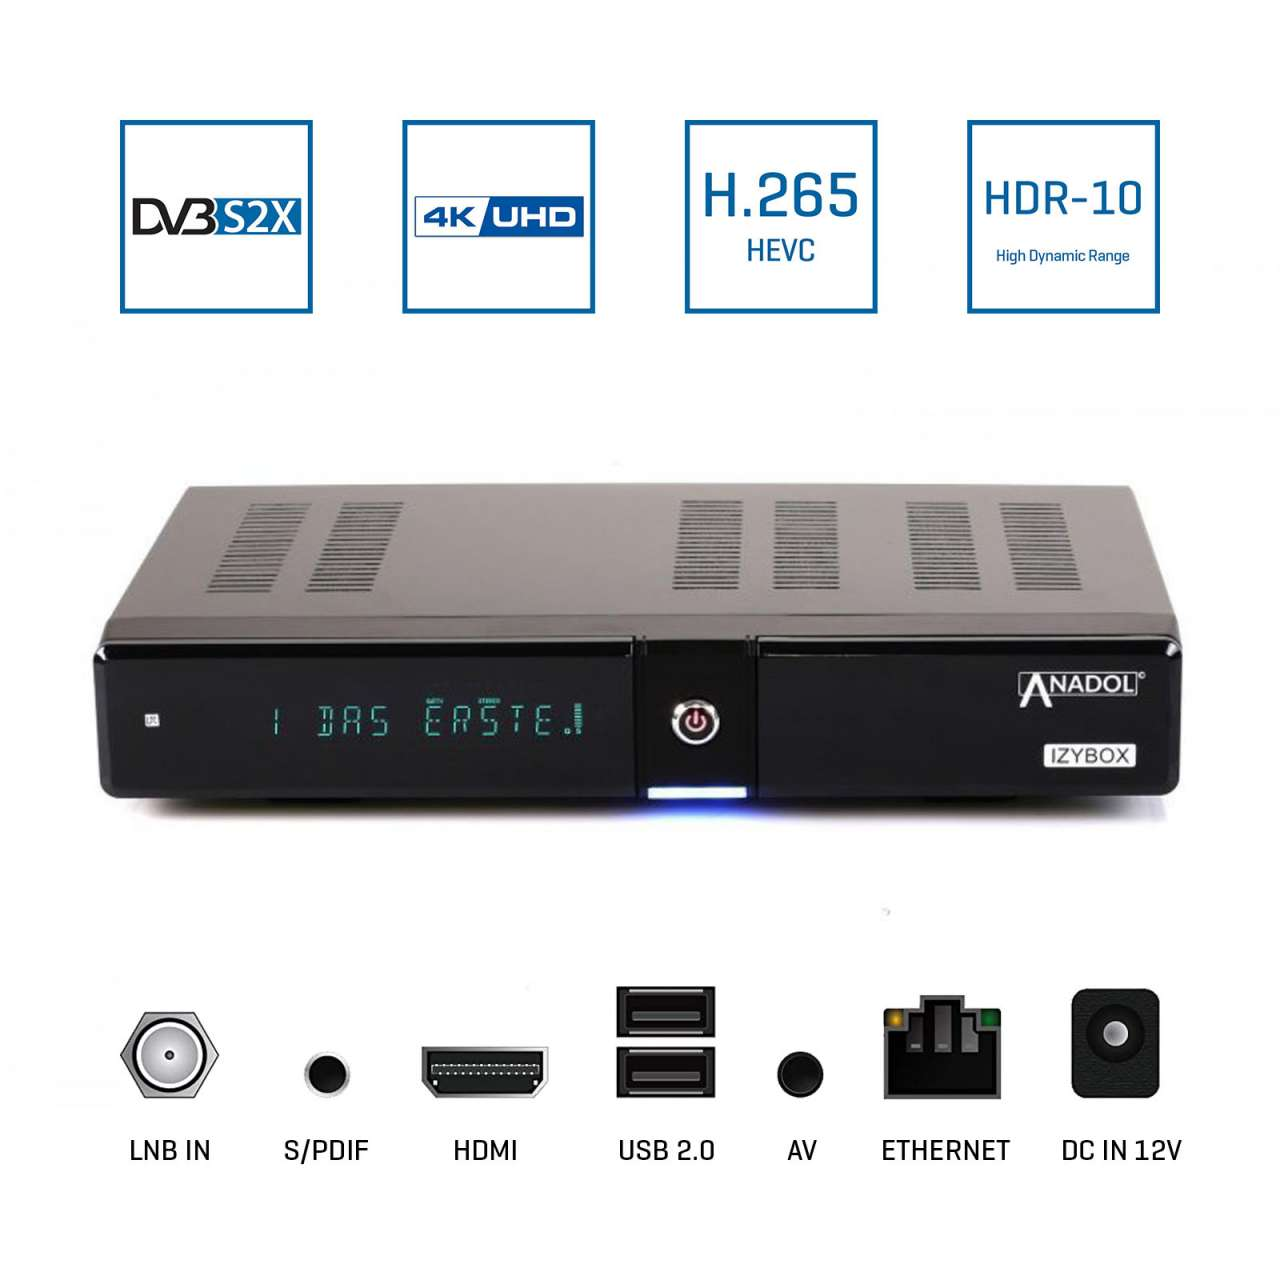 Anadol IZYBOX 4K Ultra HD DVB-S2X Tuner H.265 HEVC HDMI USB LAN Multistream Sat Receiver Schwarz RECANA014